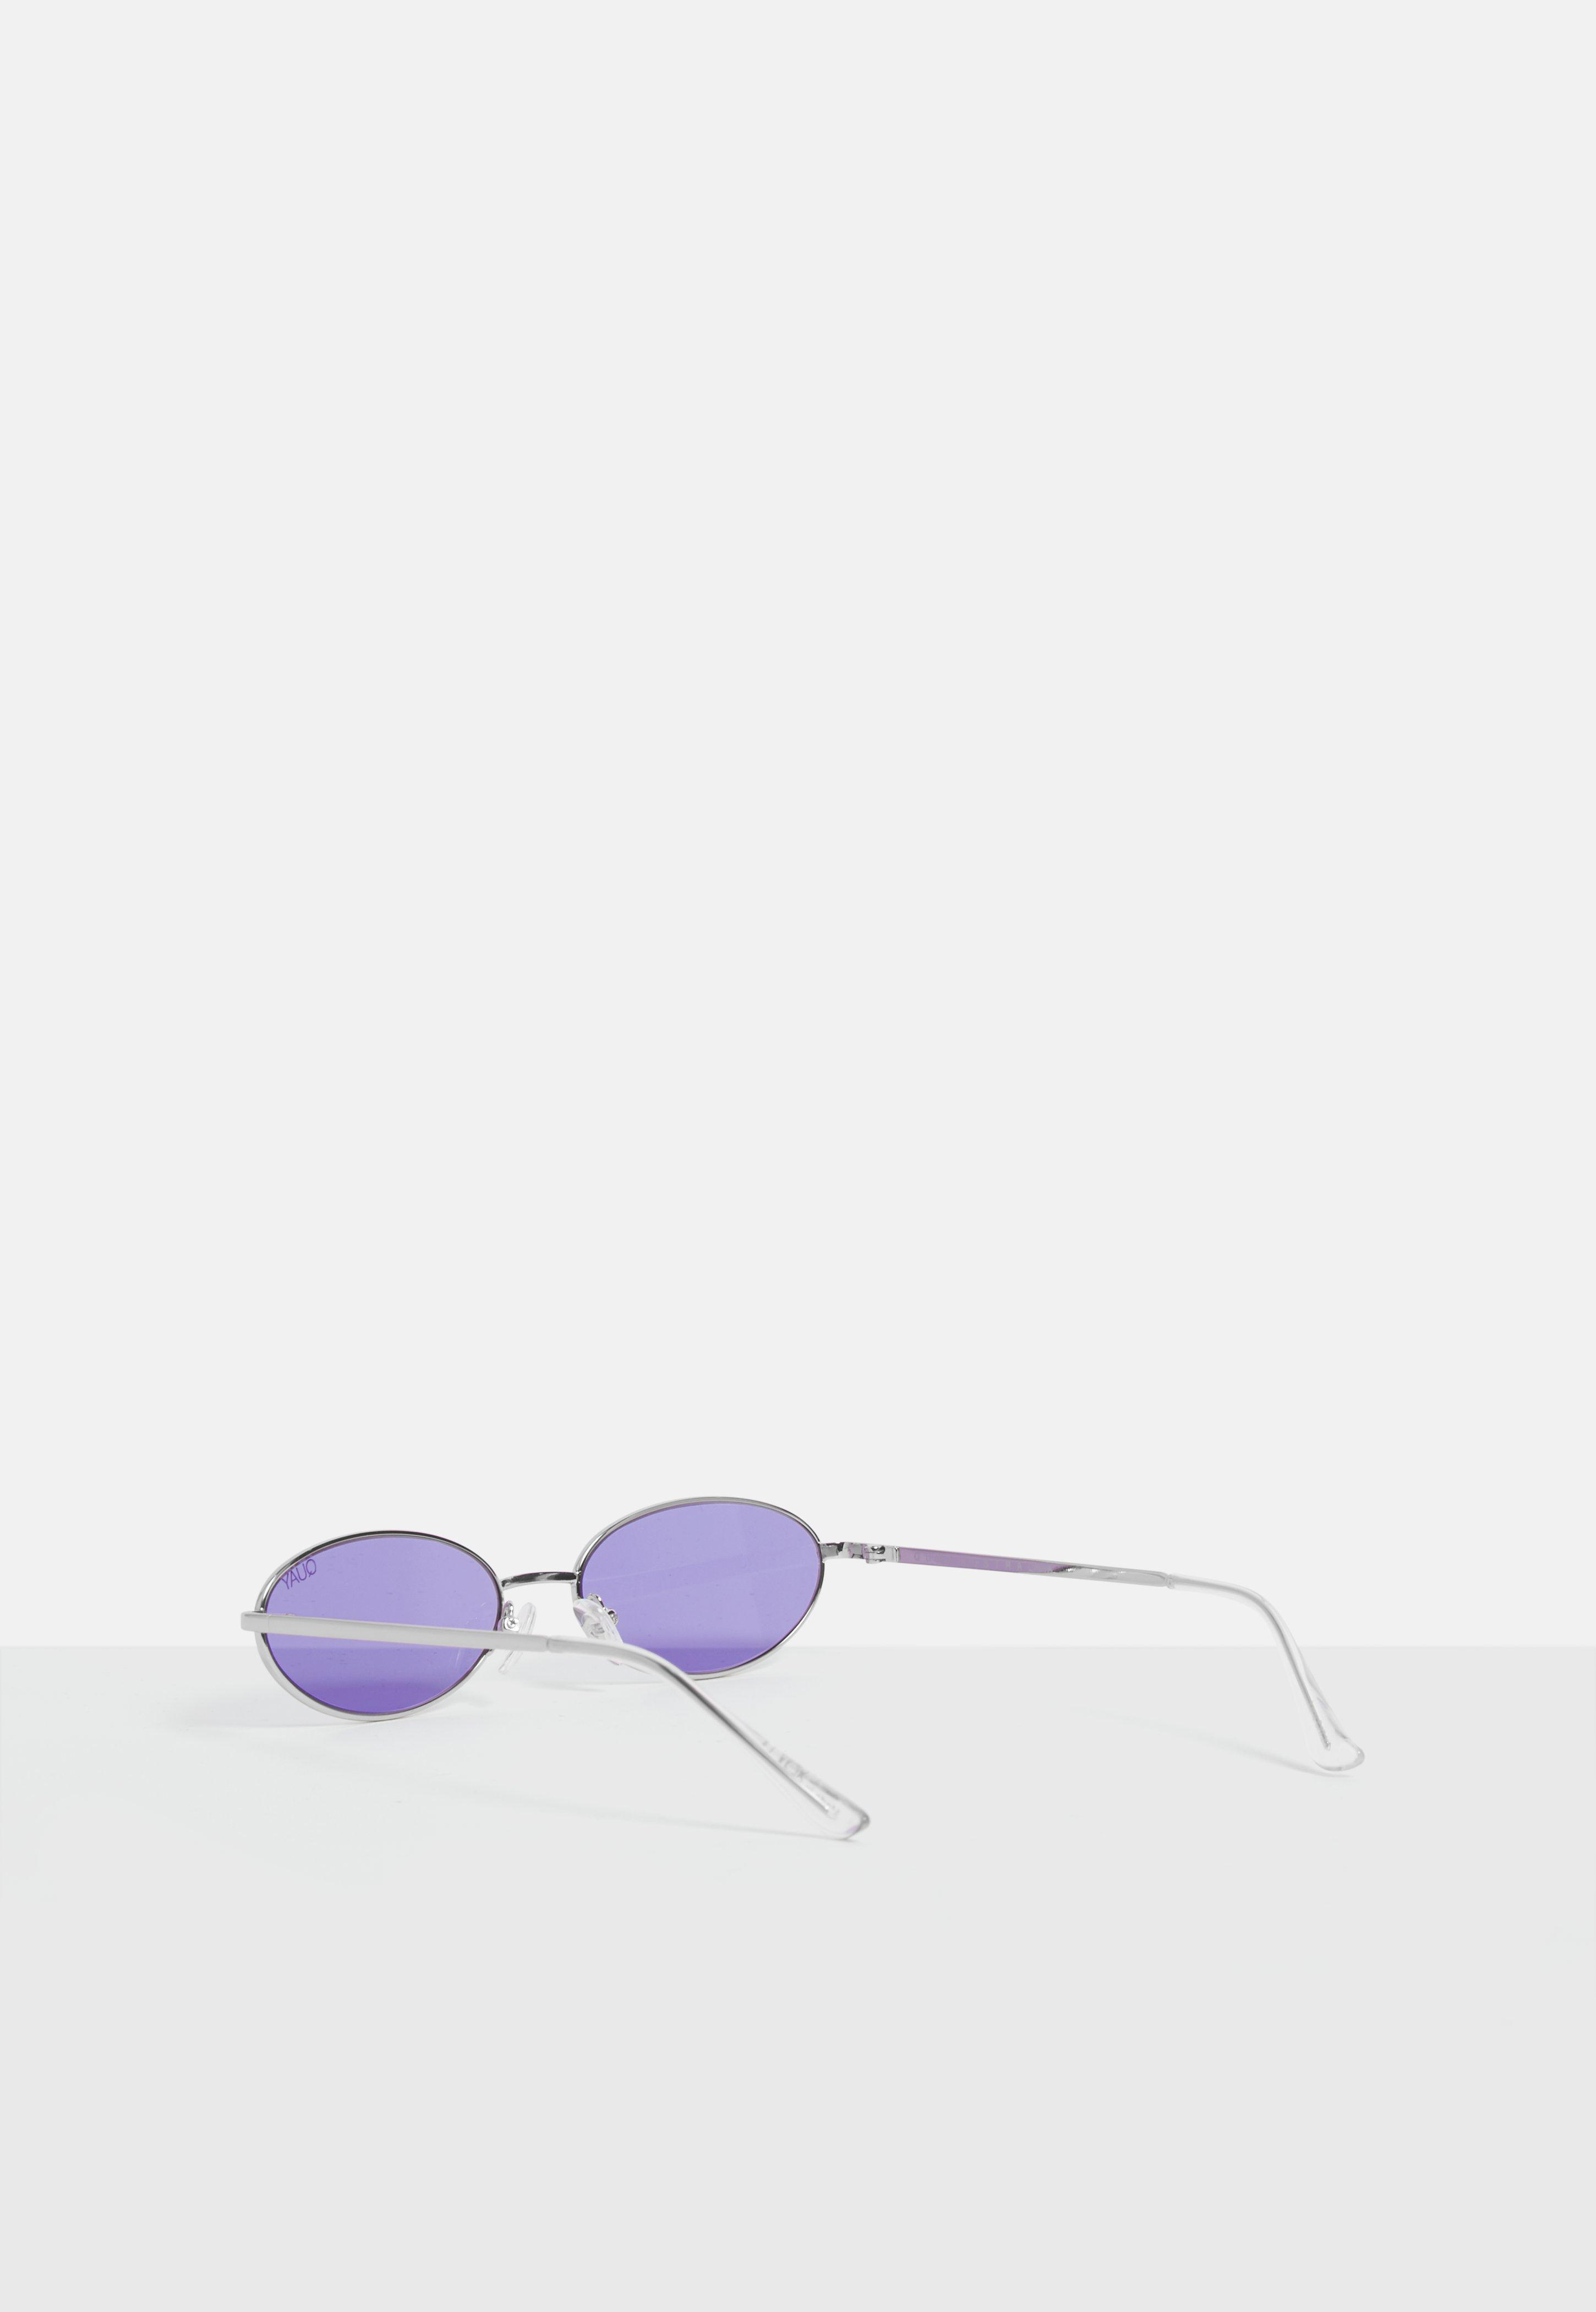 dd85a7b162 Missguided - Quay Australia X Alissa Violet Clout Purple Sunglasses - Lyst.  View fullscreen